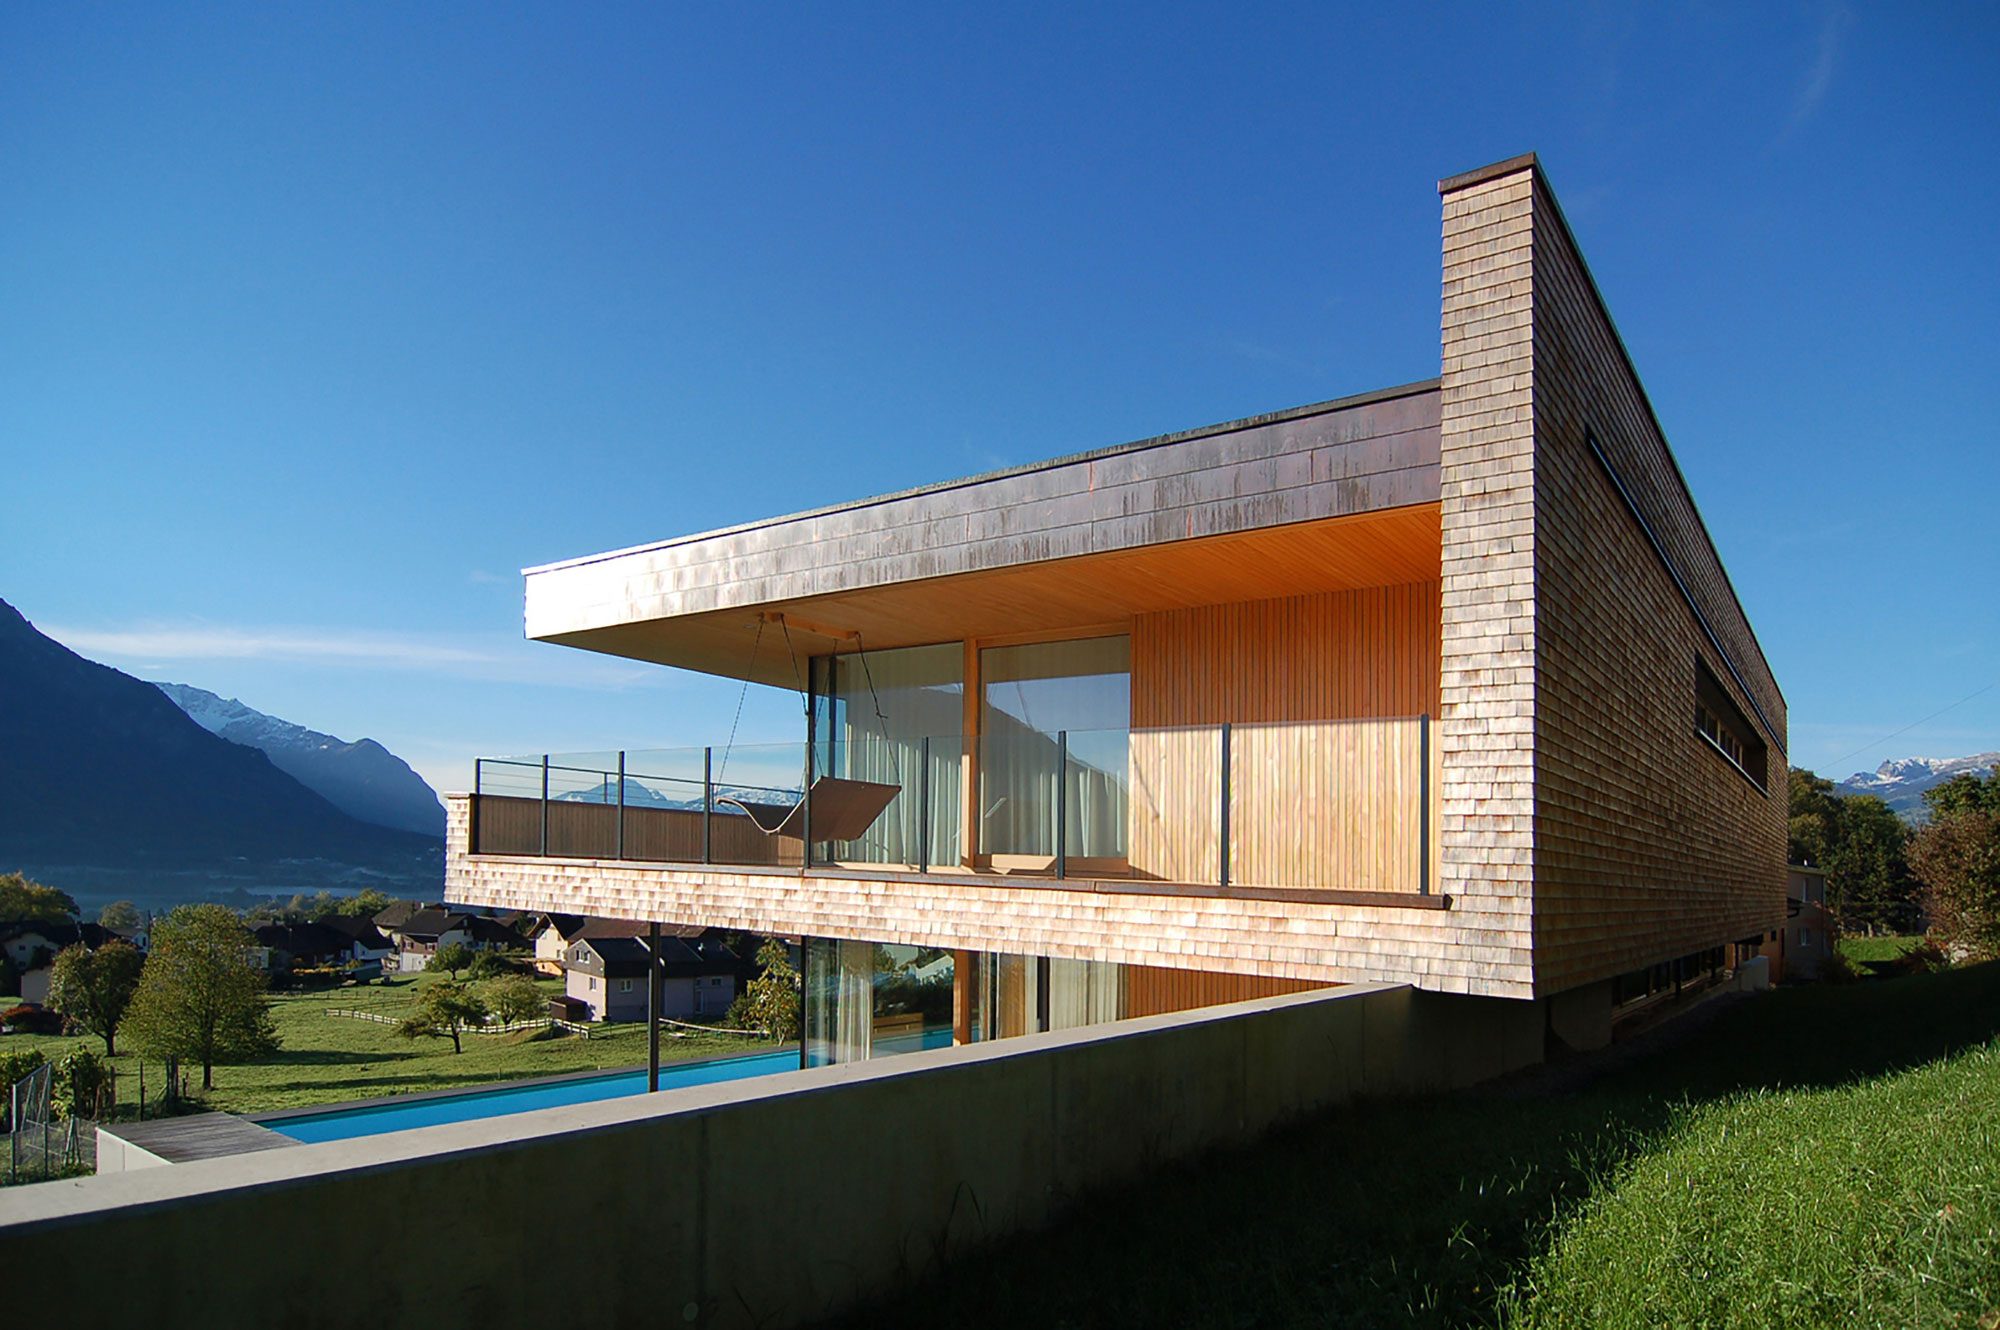 Single Family Home in Schaan by k_m architektur